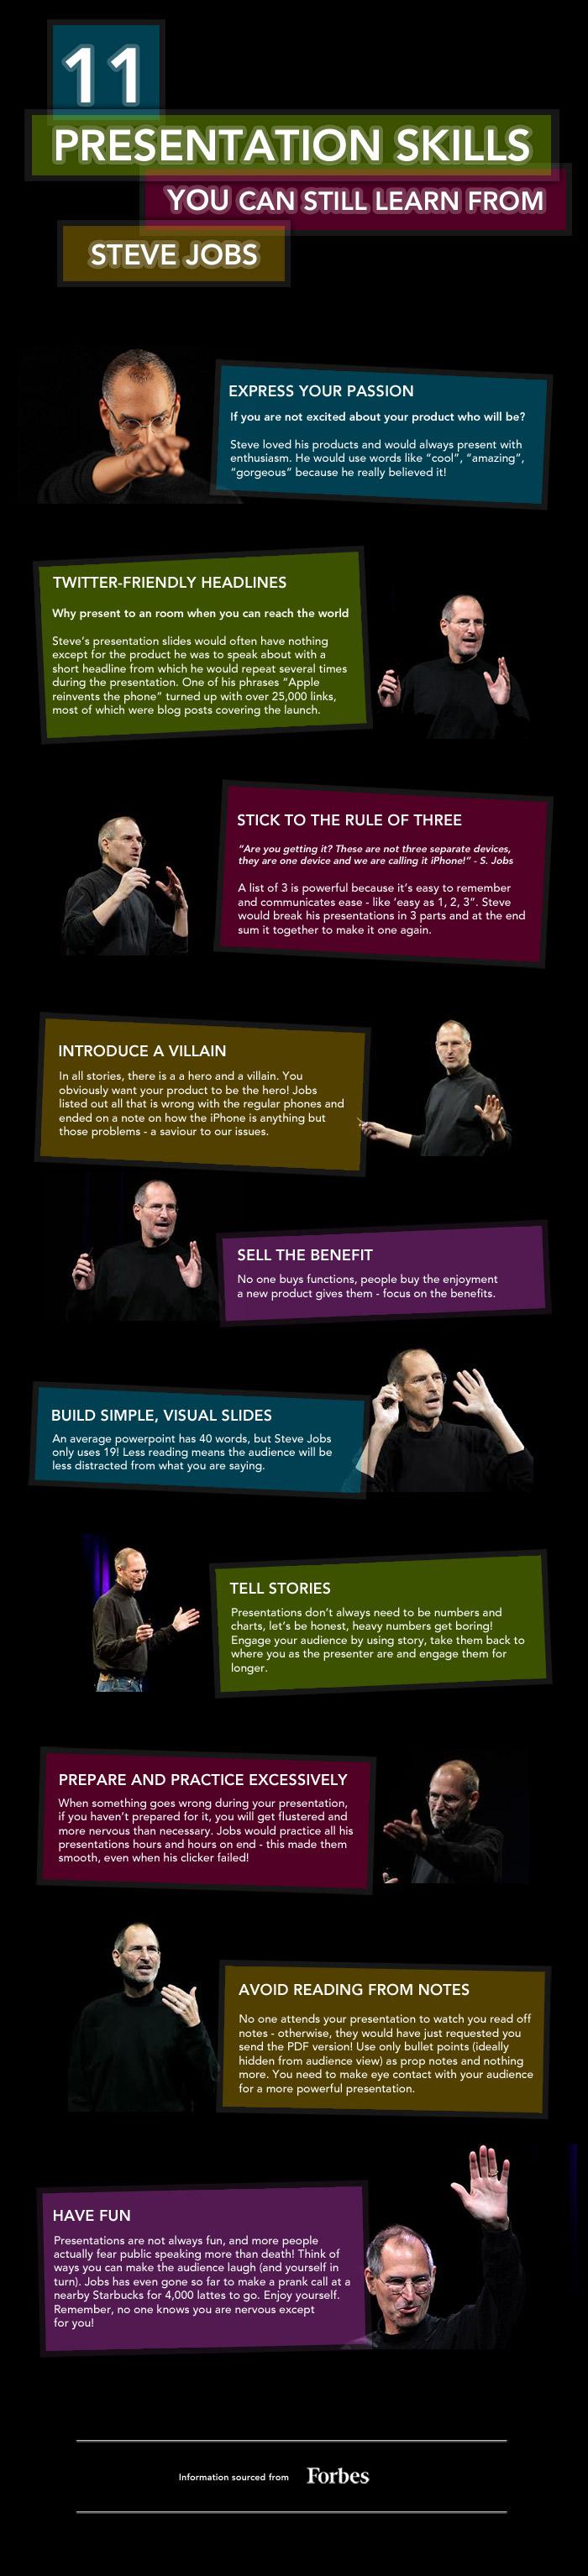 Presentation Skills from Steve Jobs